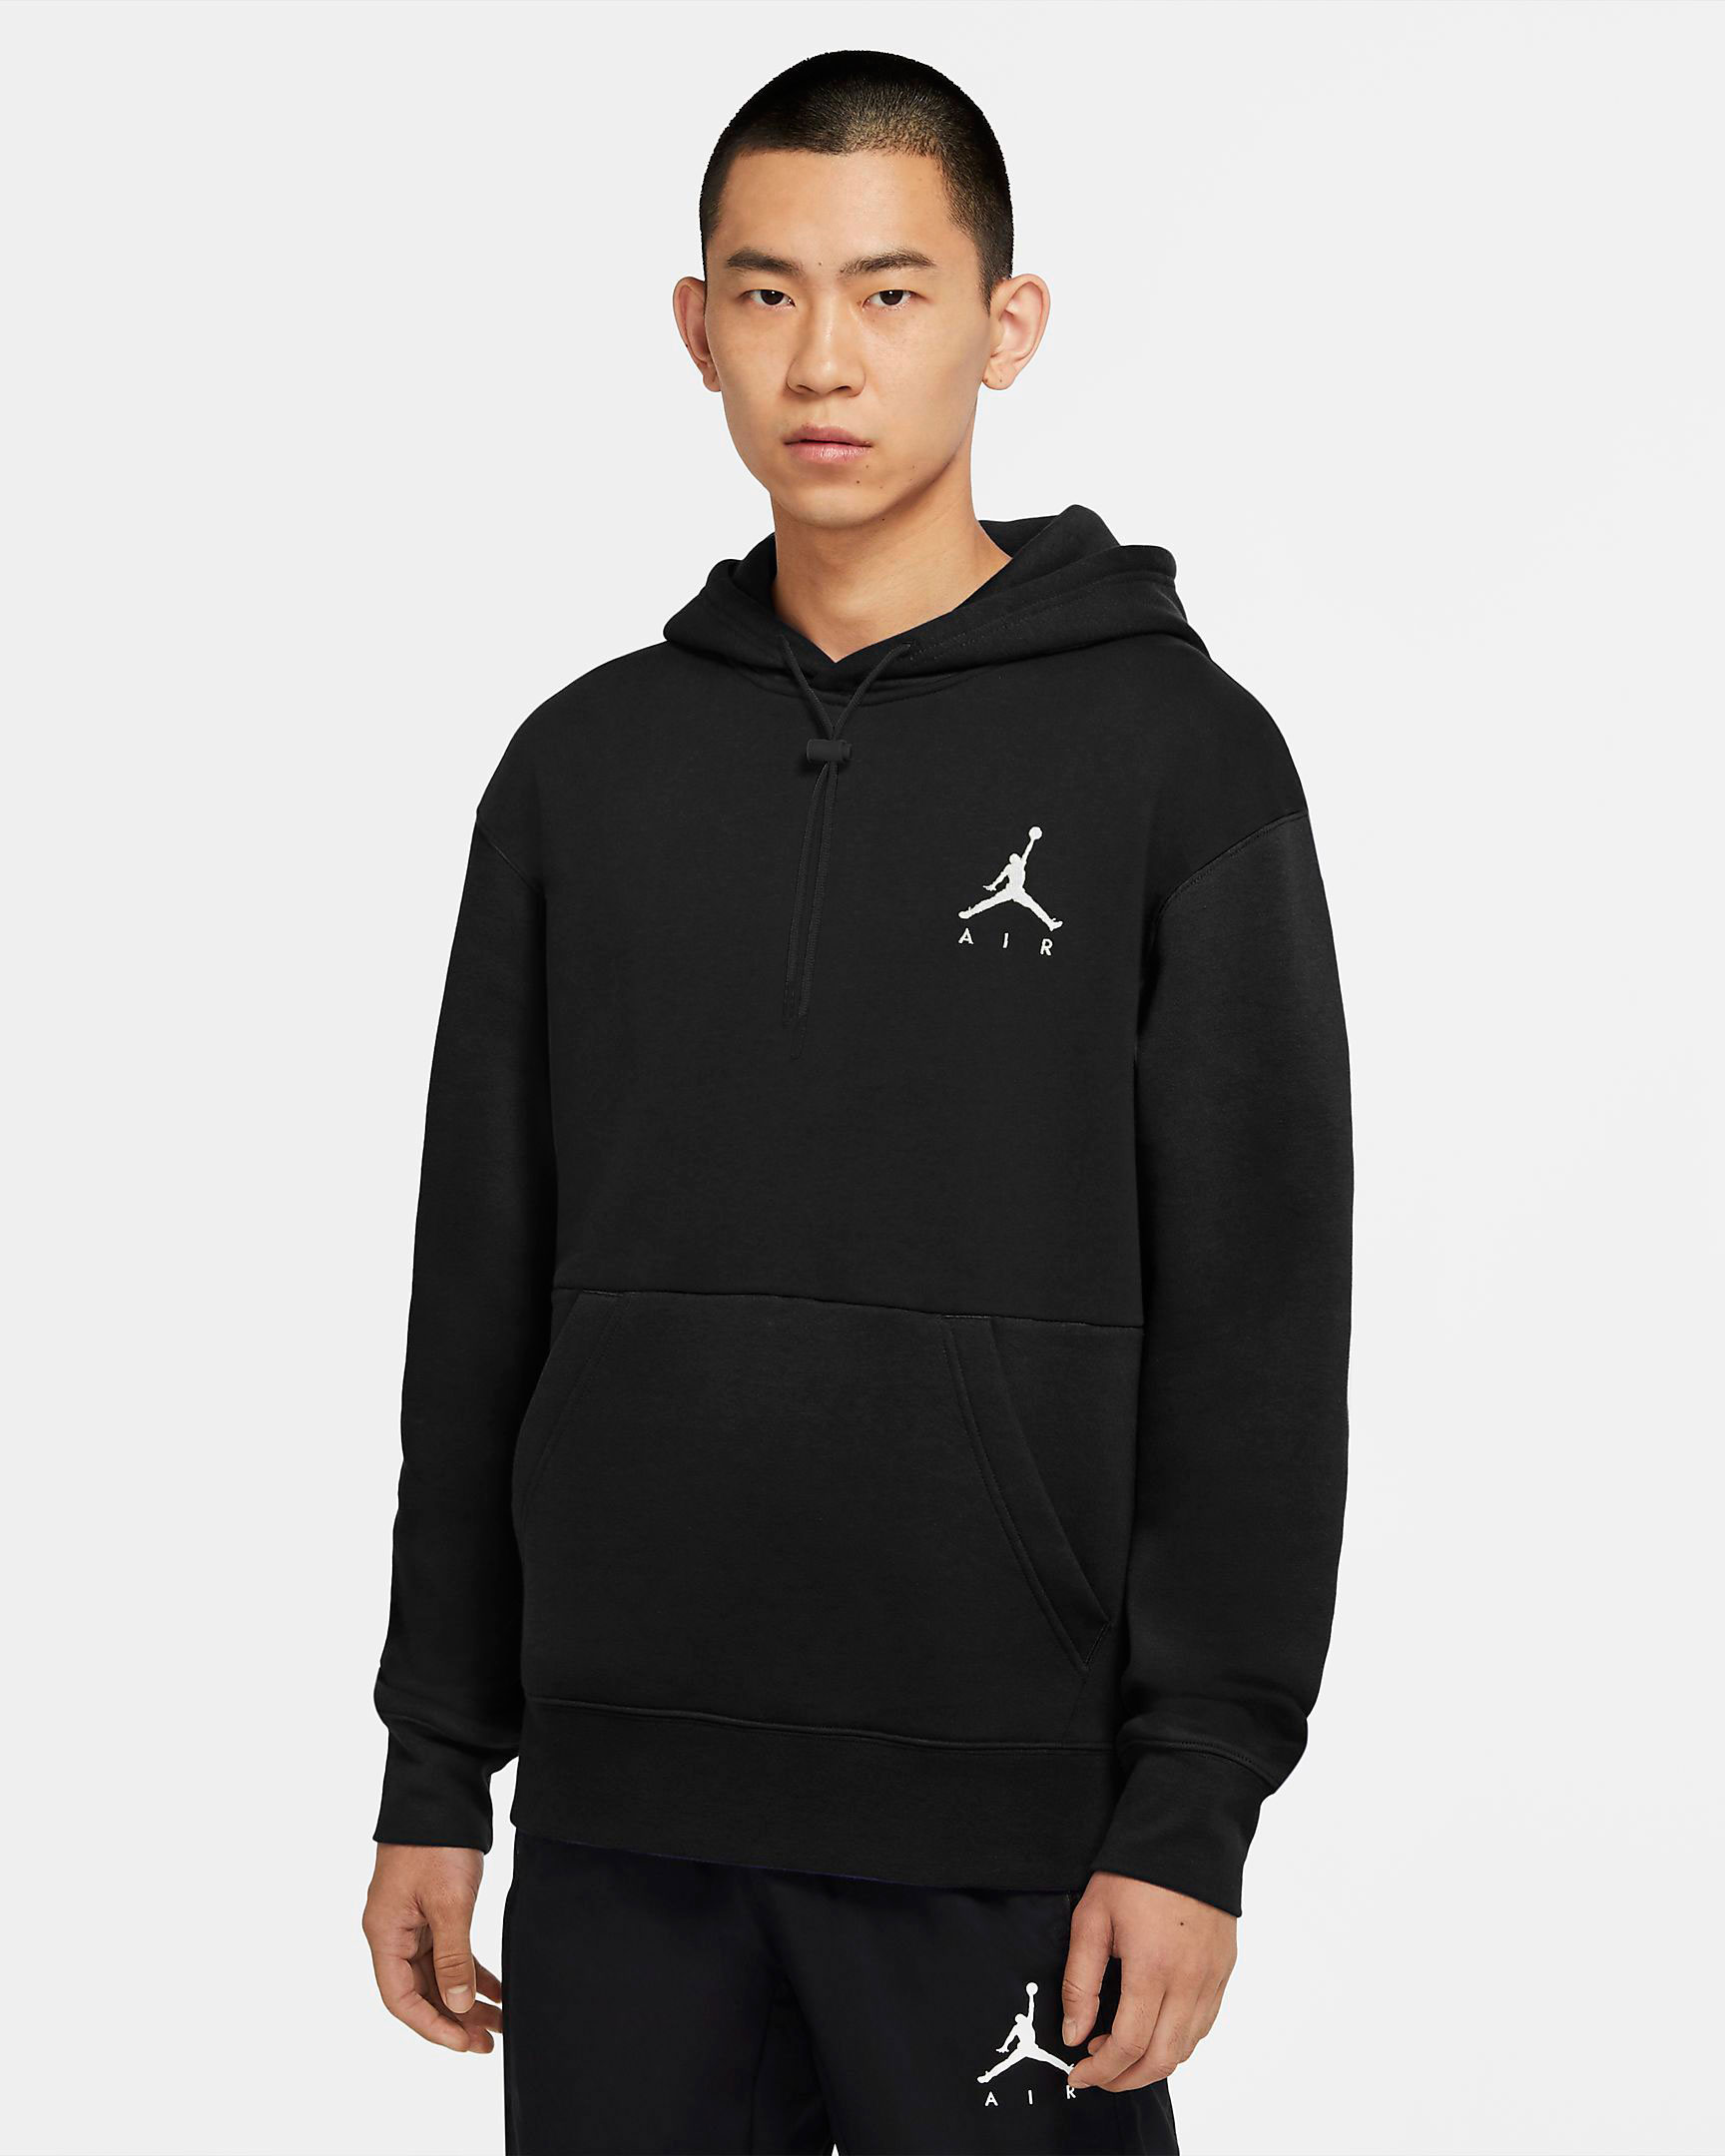 jordan-11-adapt-white-hoodie-match